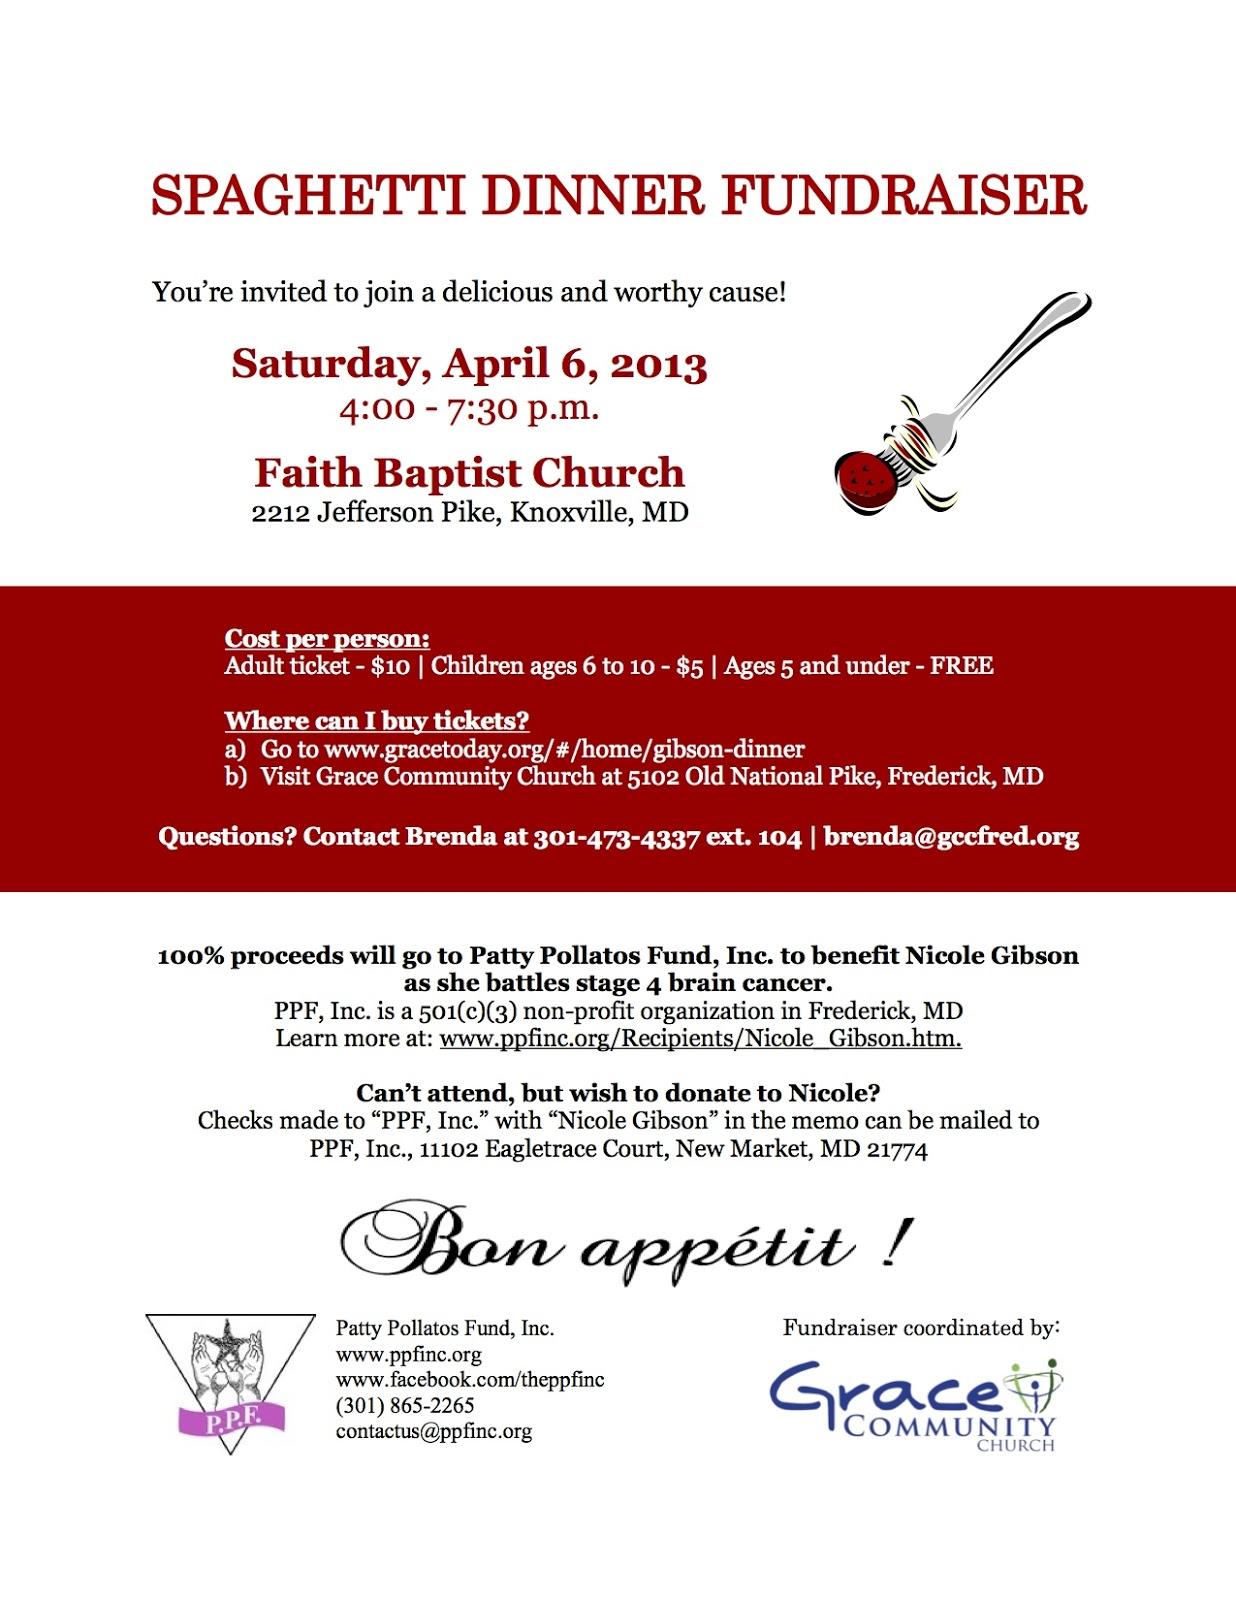 Spaghetti Dinner Ticket Template fundraiser holding a fundraiser – Sample Tickets for Fundraisers